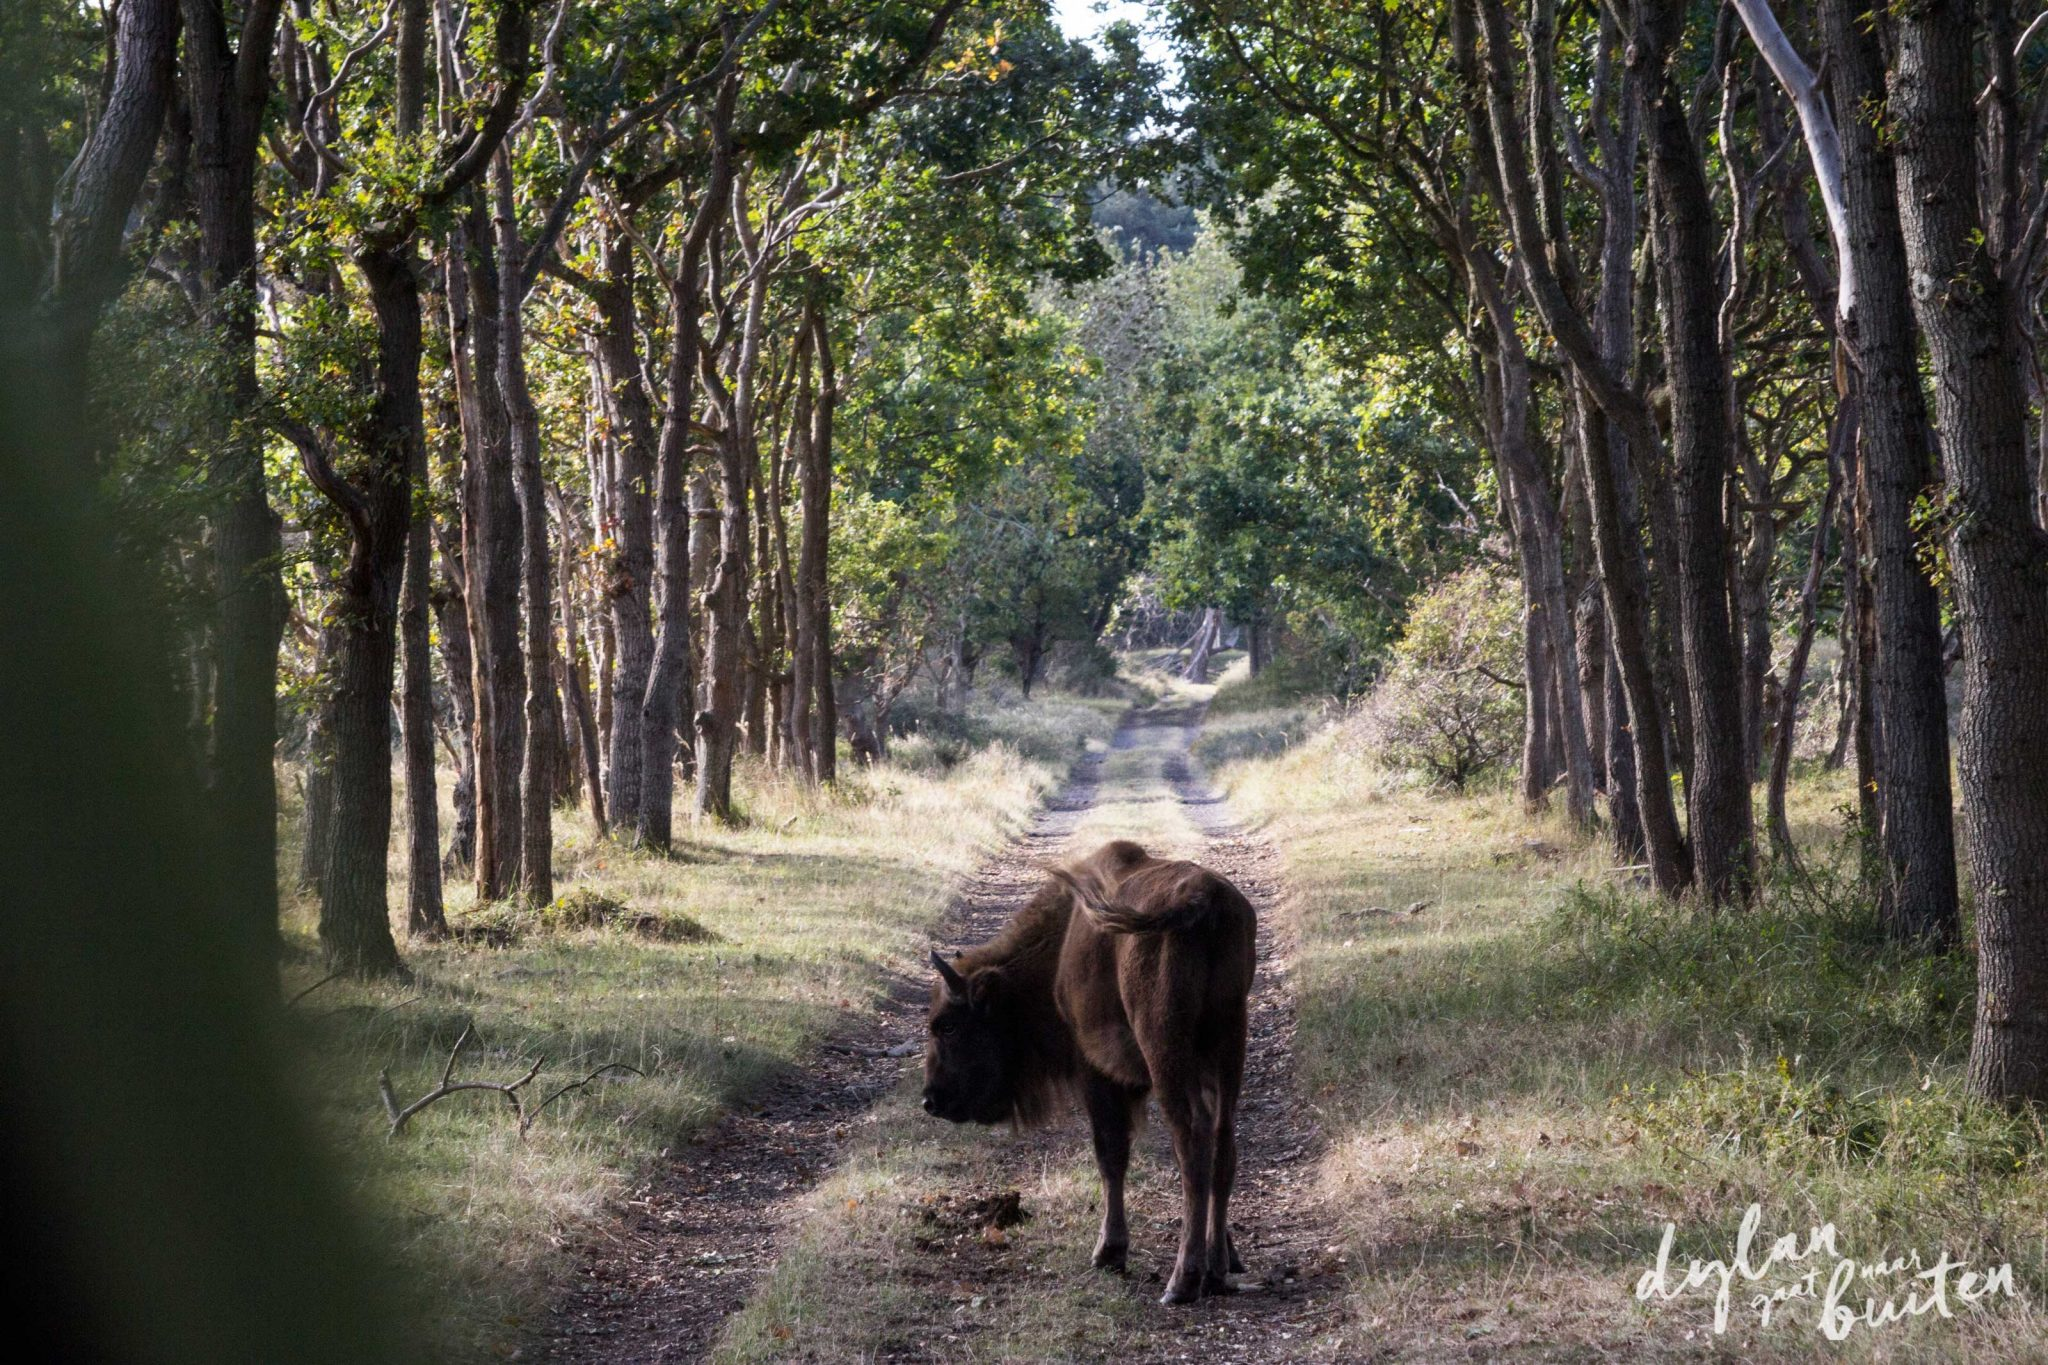 Natuurfotografie van Europese bizons